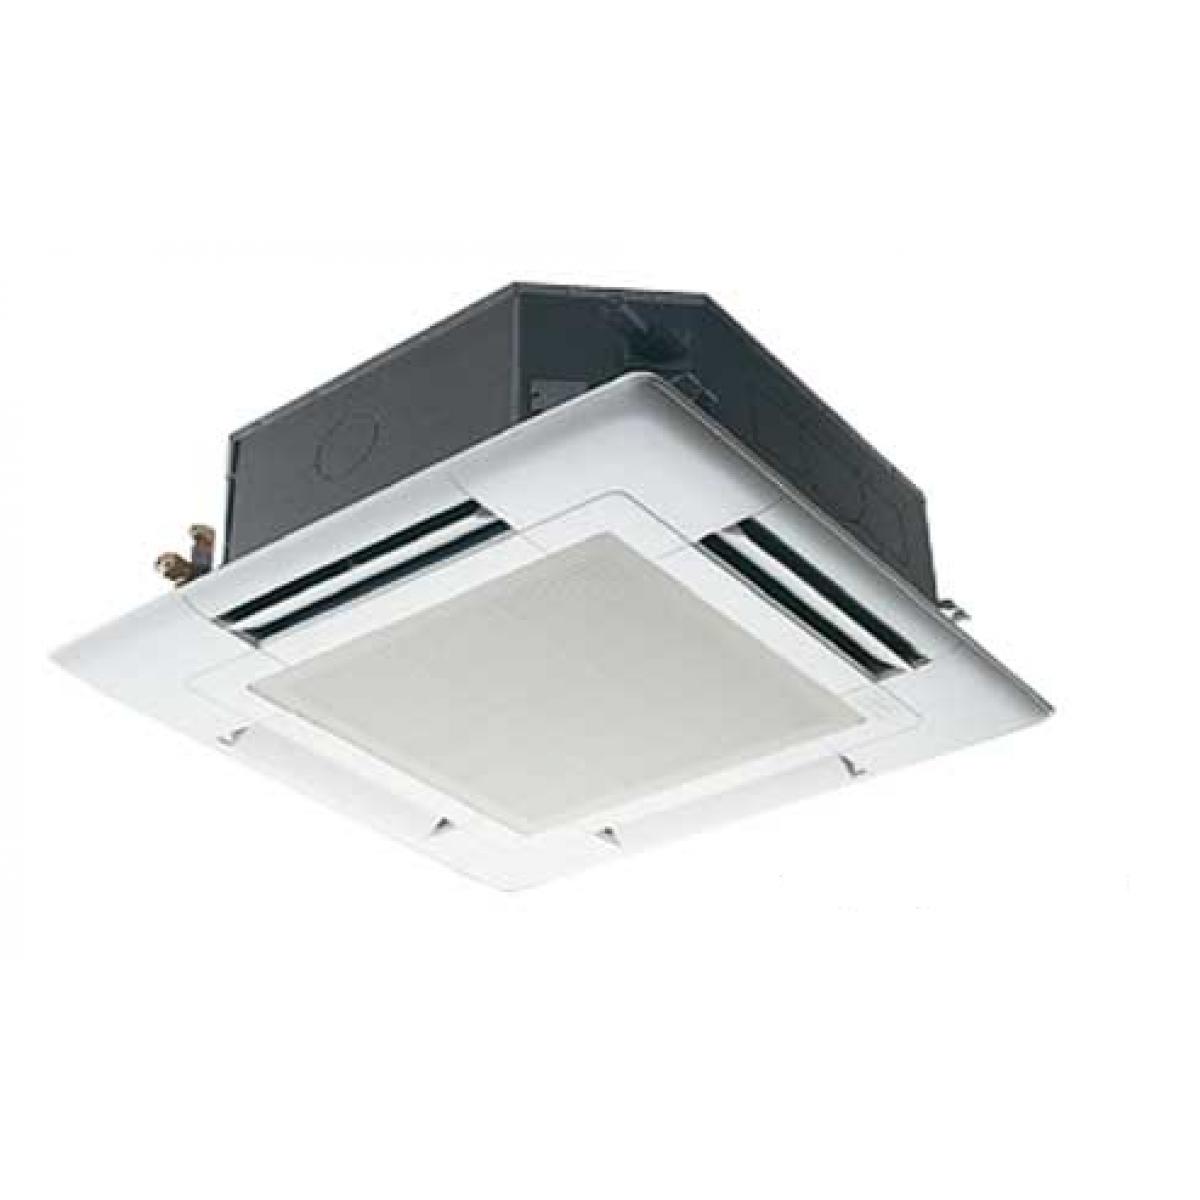 Mxz 3c24na Split Air Conditioning And Heating 24k Btu Up